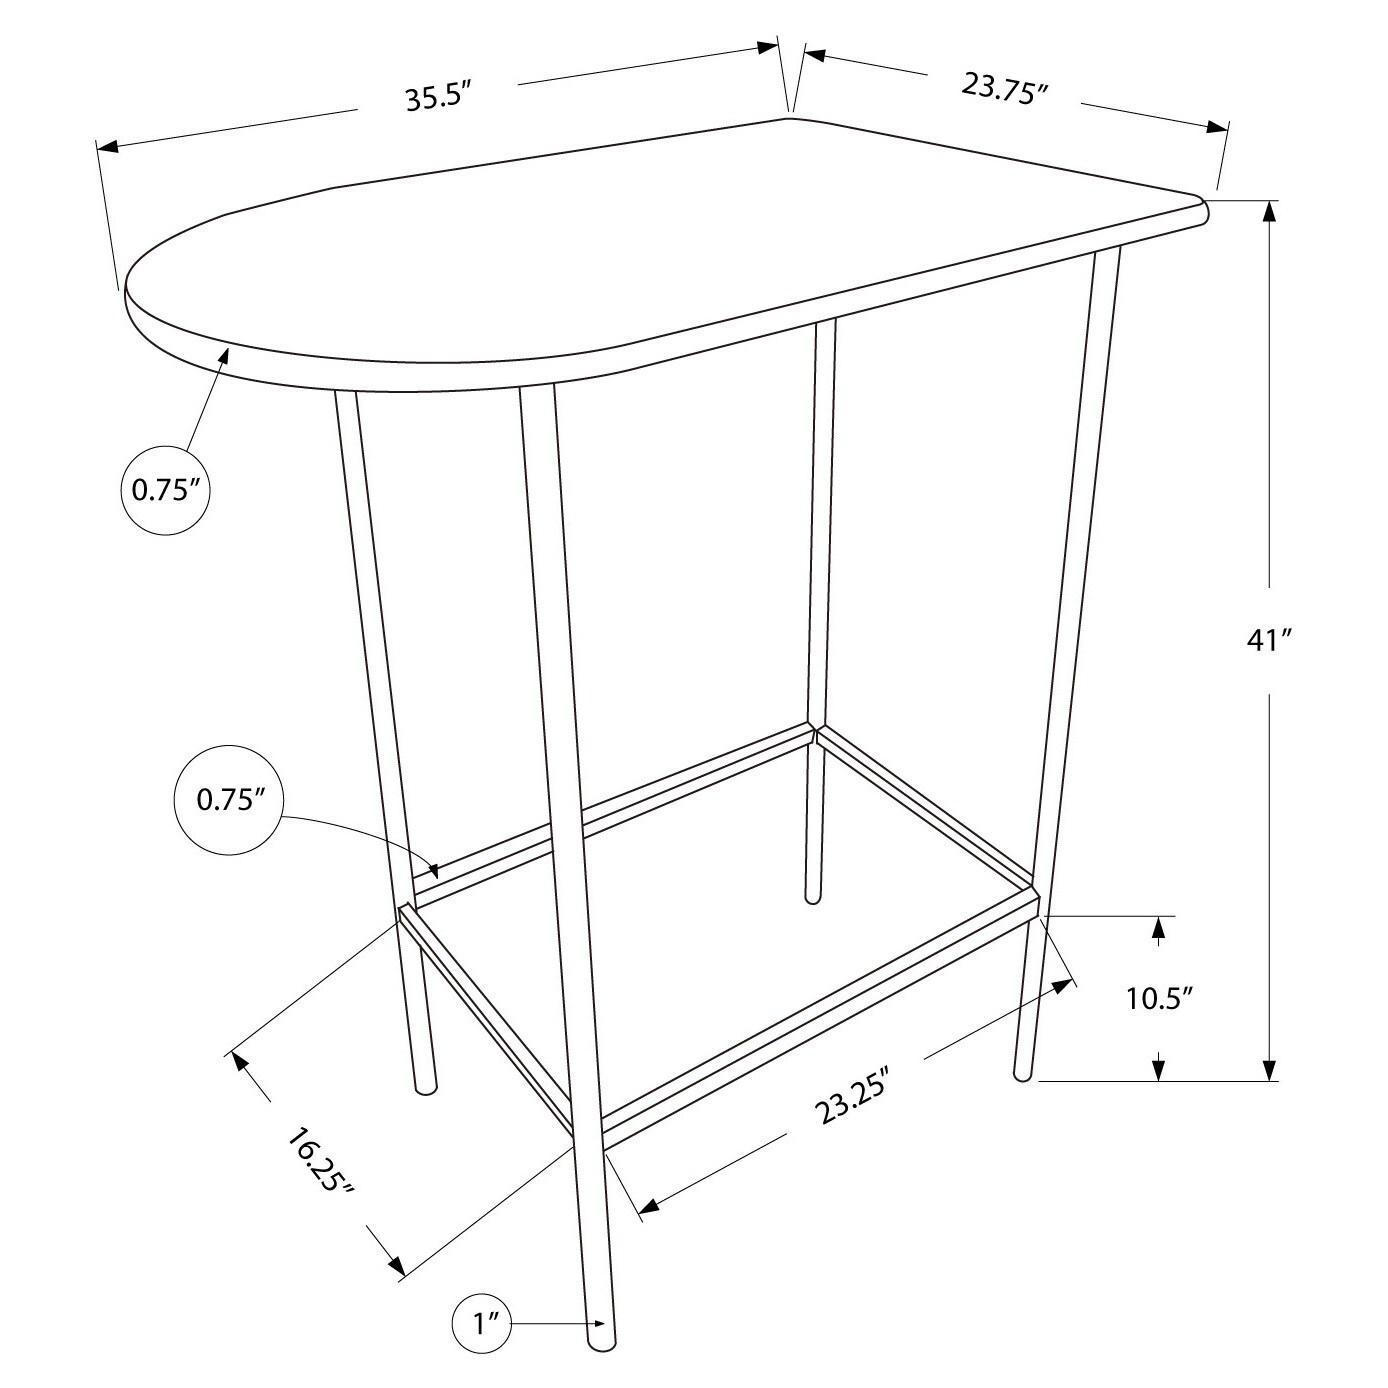 Cappuccino black metal space saver bar table free shipping today cappuccino black metal space saver bar table free shipping today overstock 13934579 watchthetrailerfo